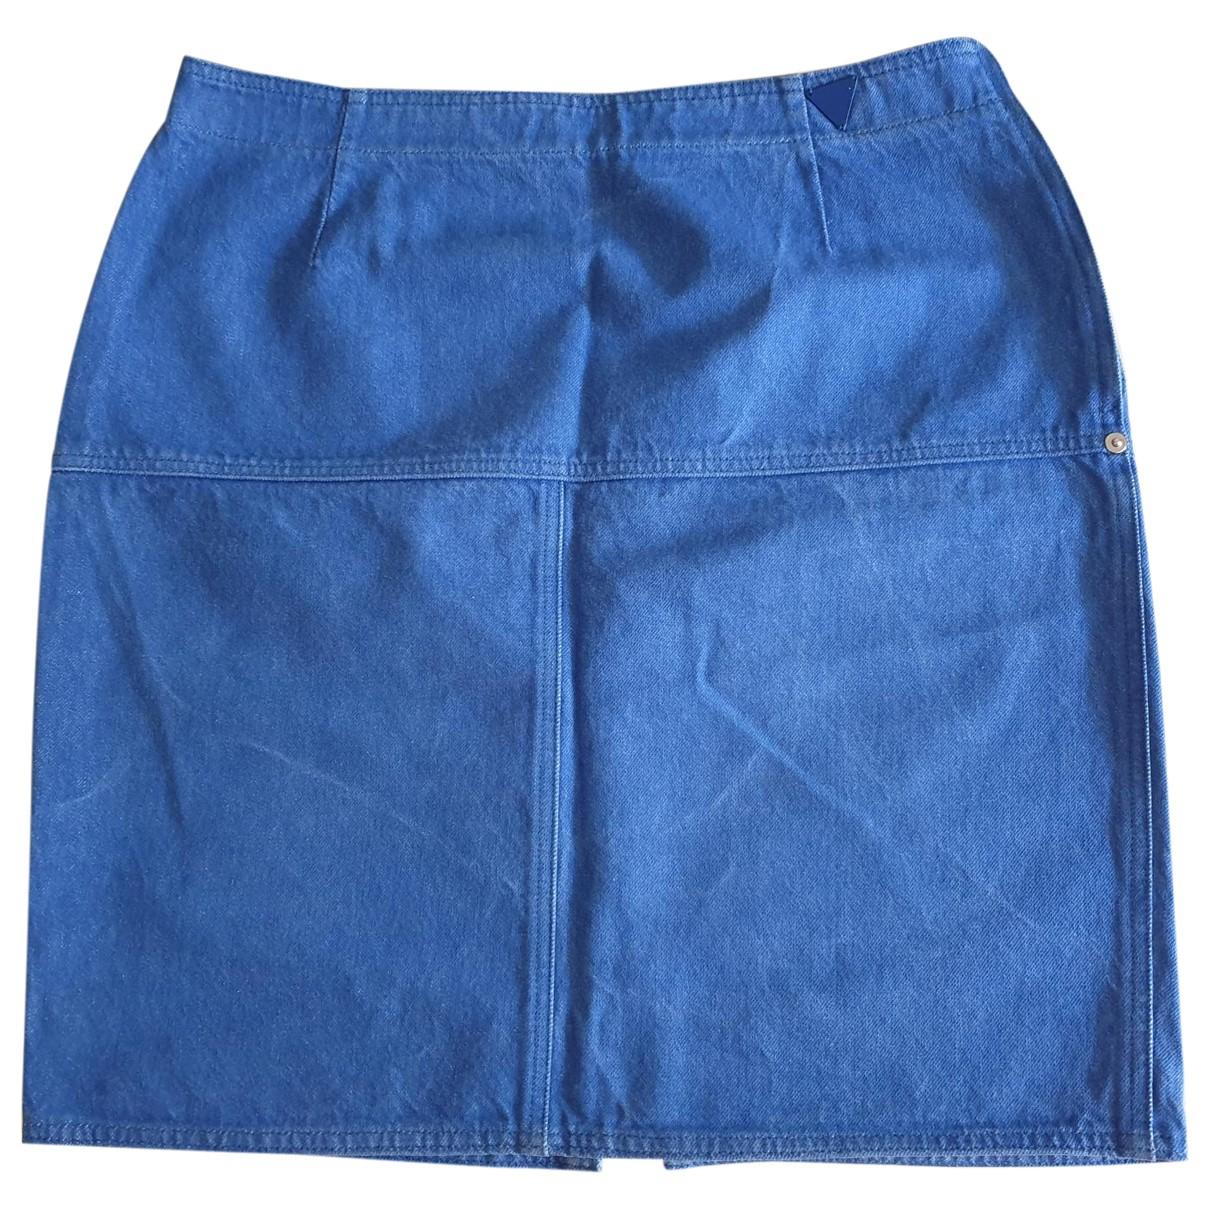 Genny - Jupe   pour femme en denim - bleu